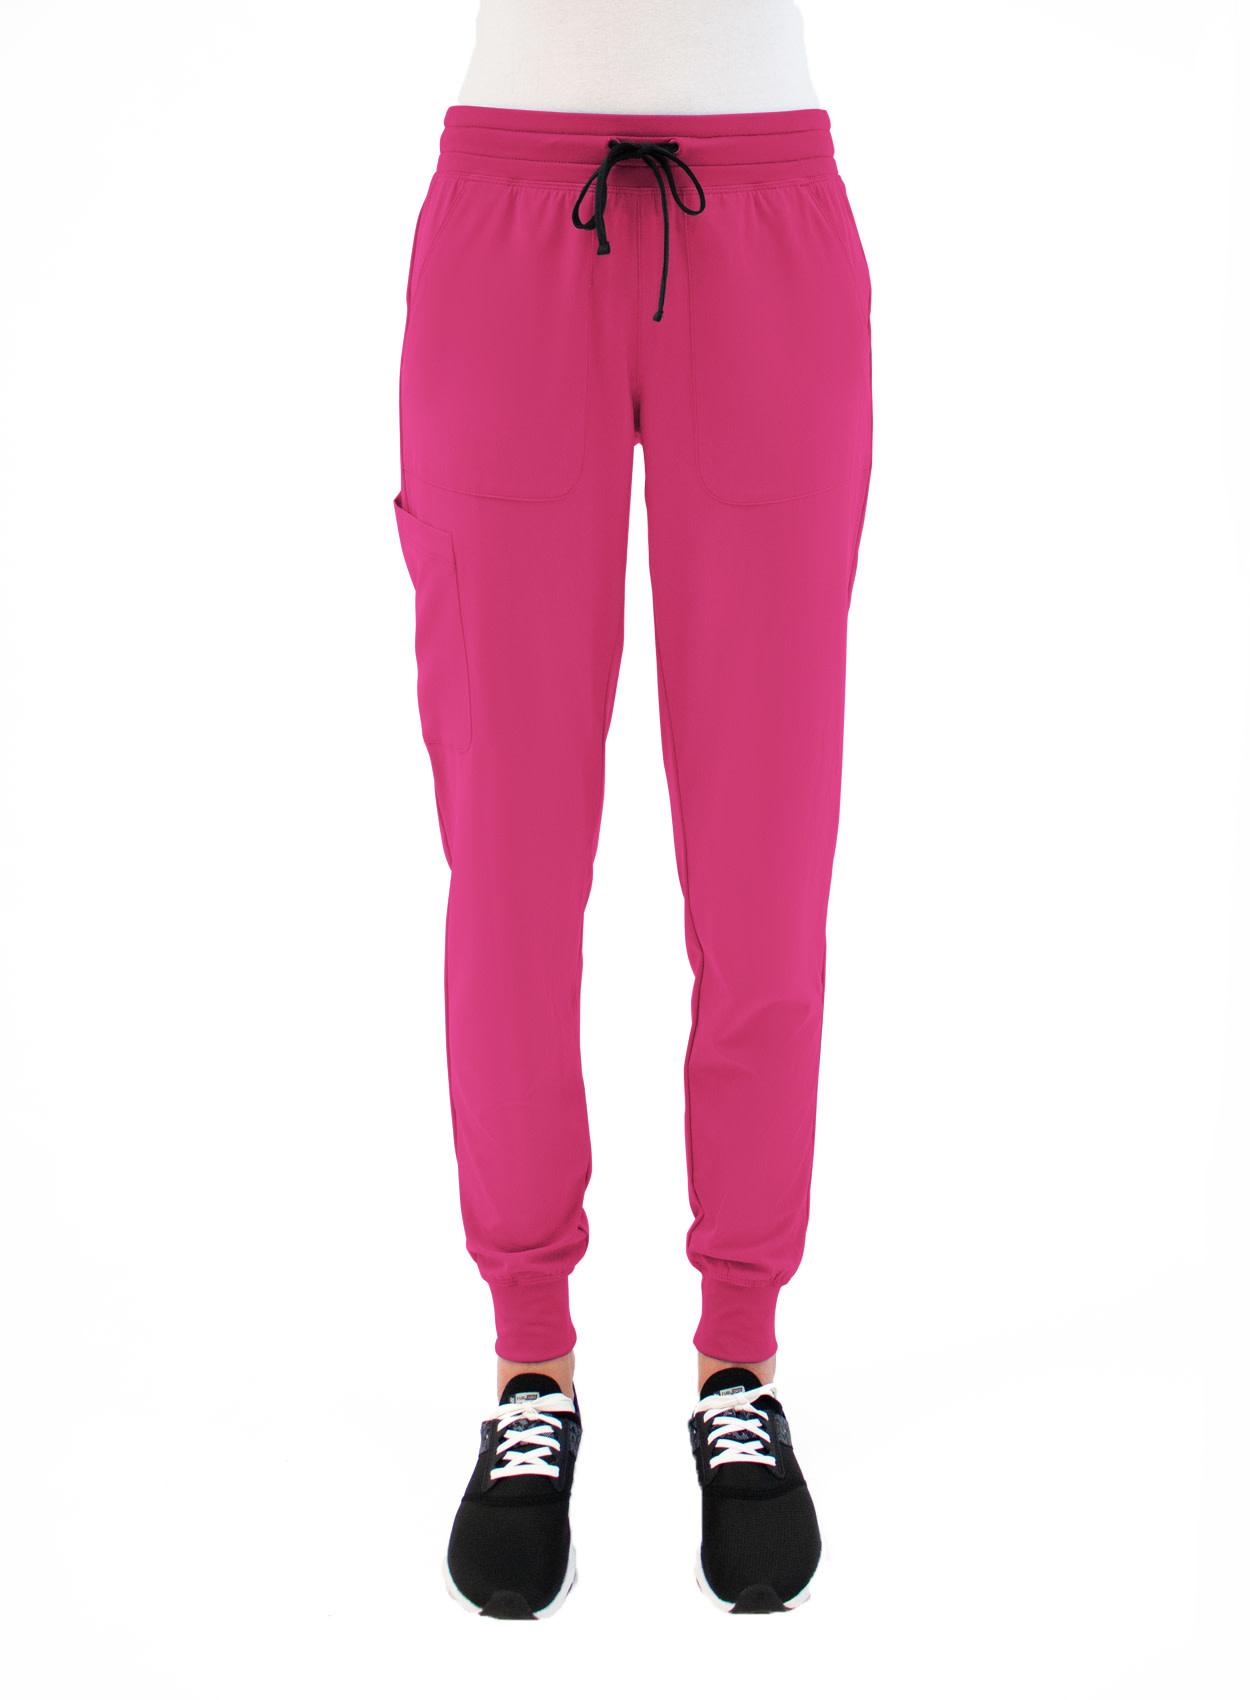 MATRIX IMPULSE Hot Pink Yoga Waistband Women's Jogger Pants 8520